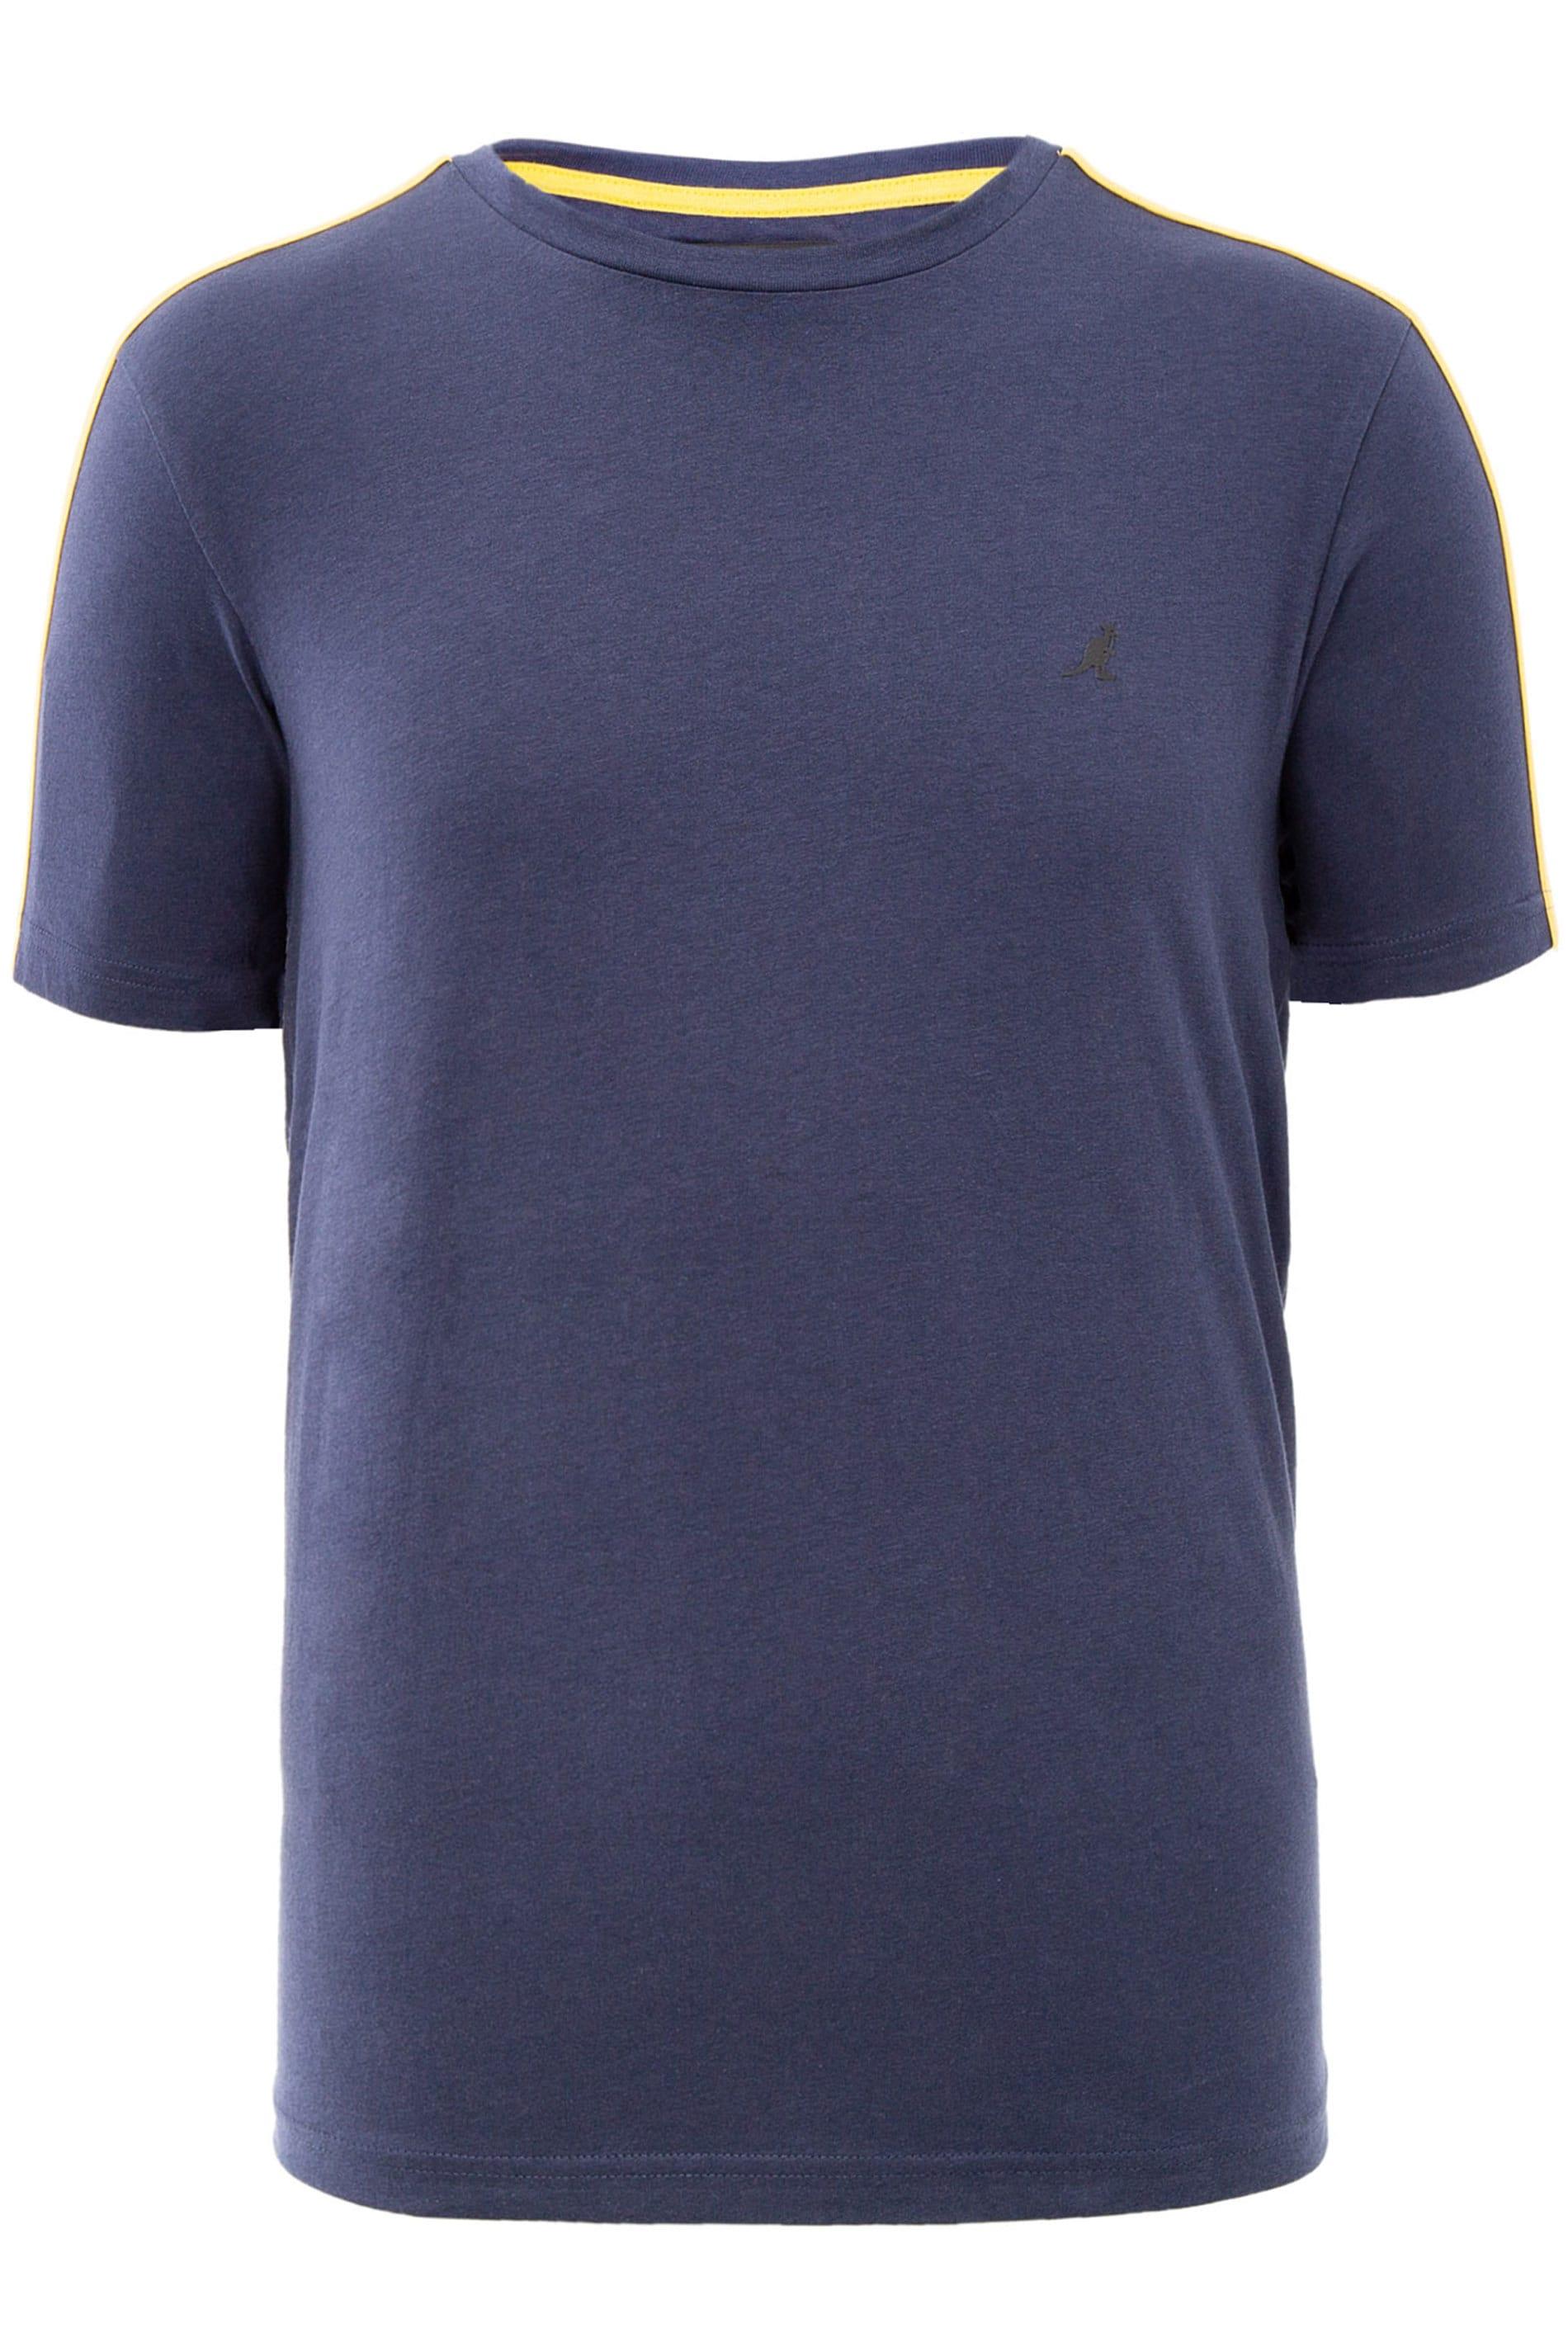 KANGOL Navy Contrast Panel T-Shirt